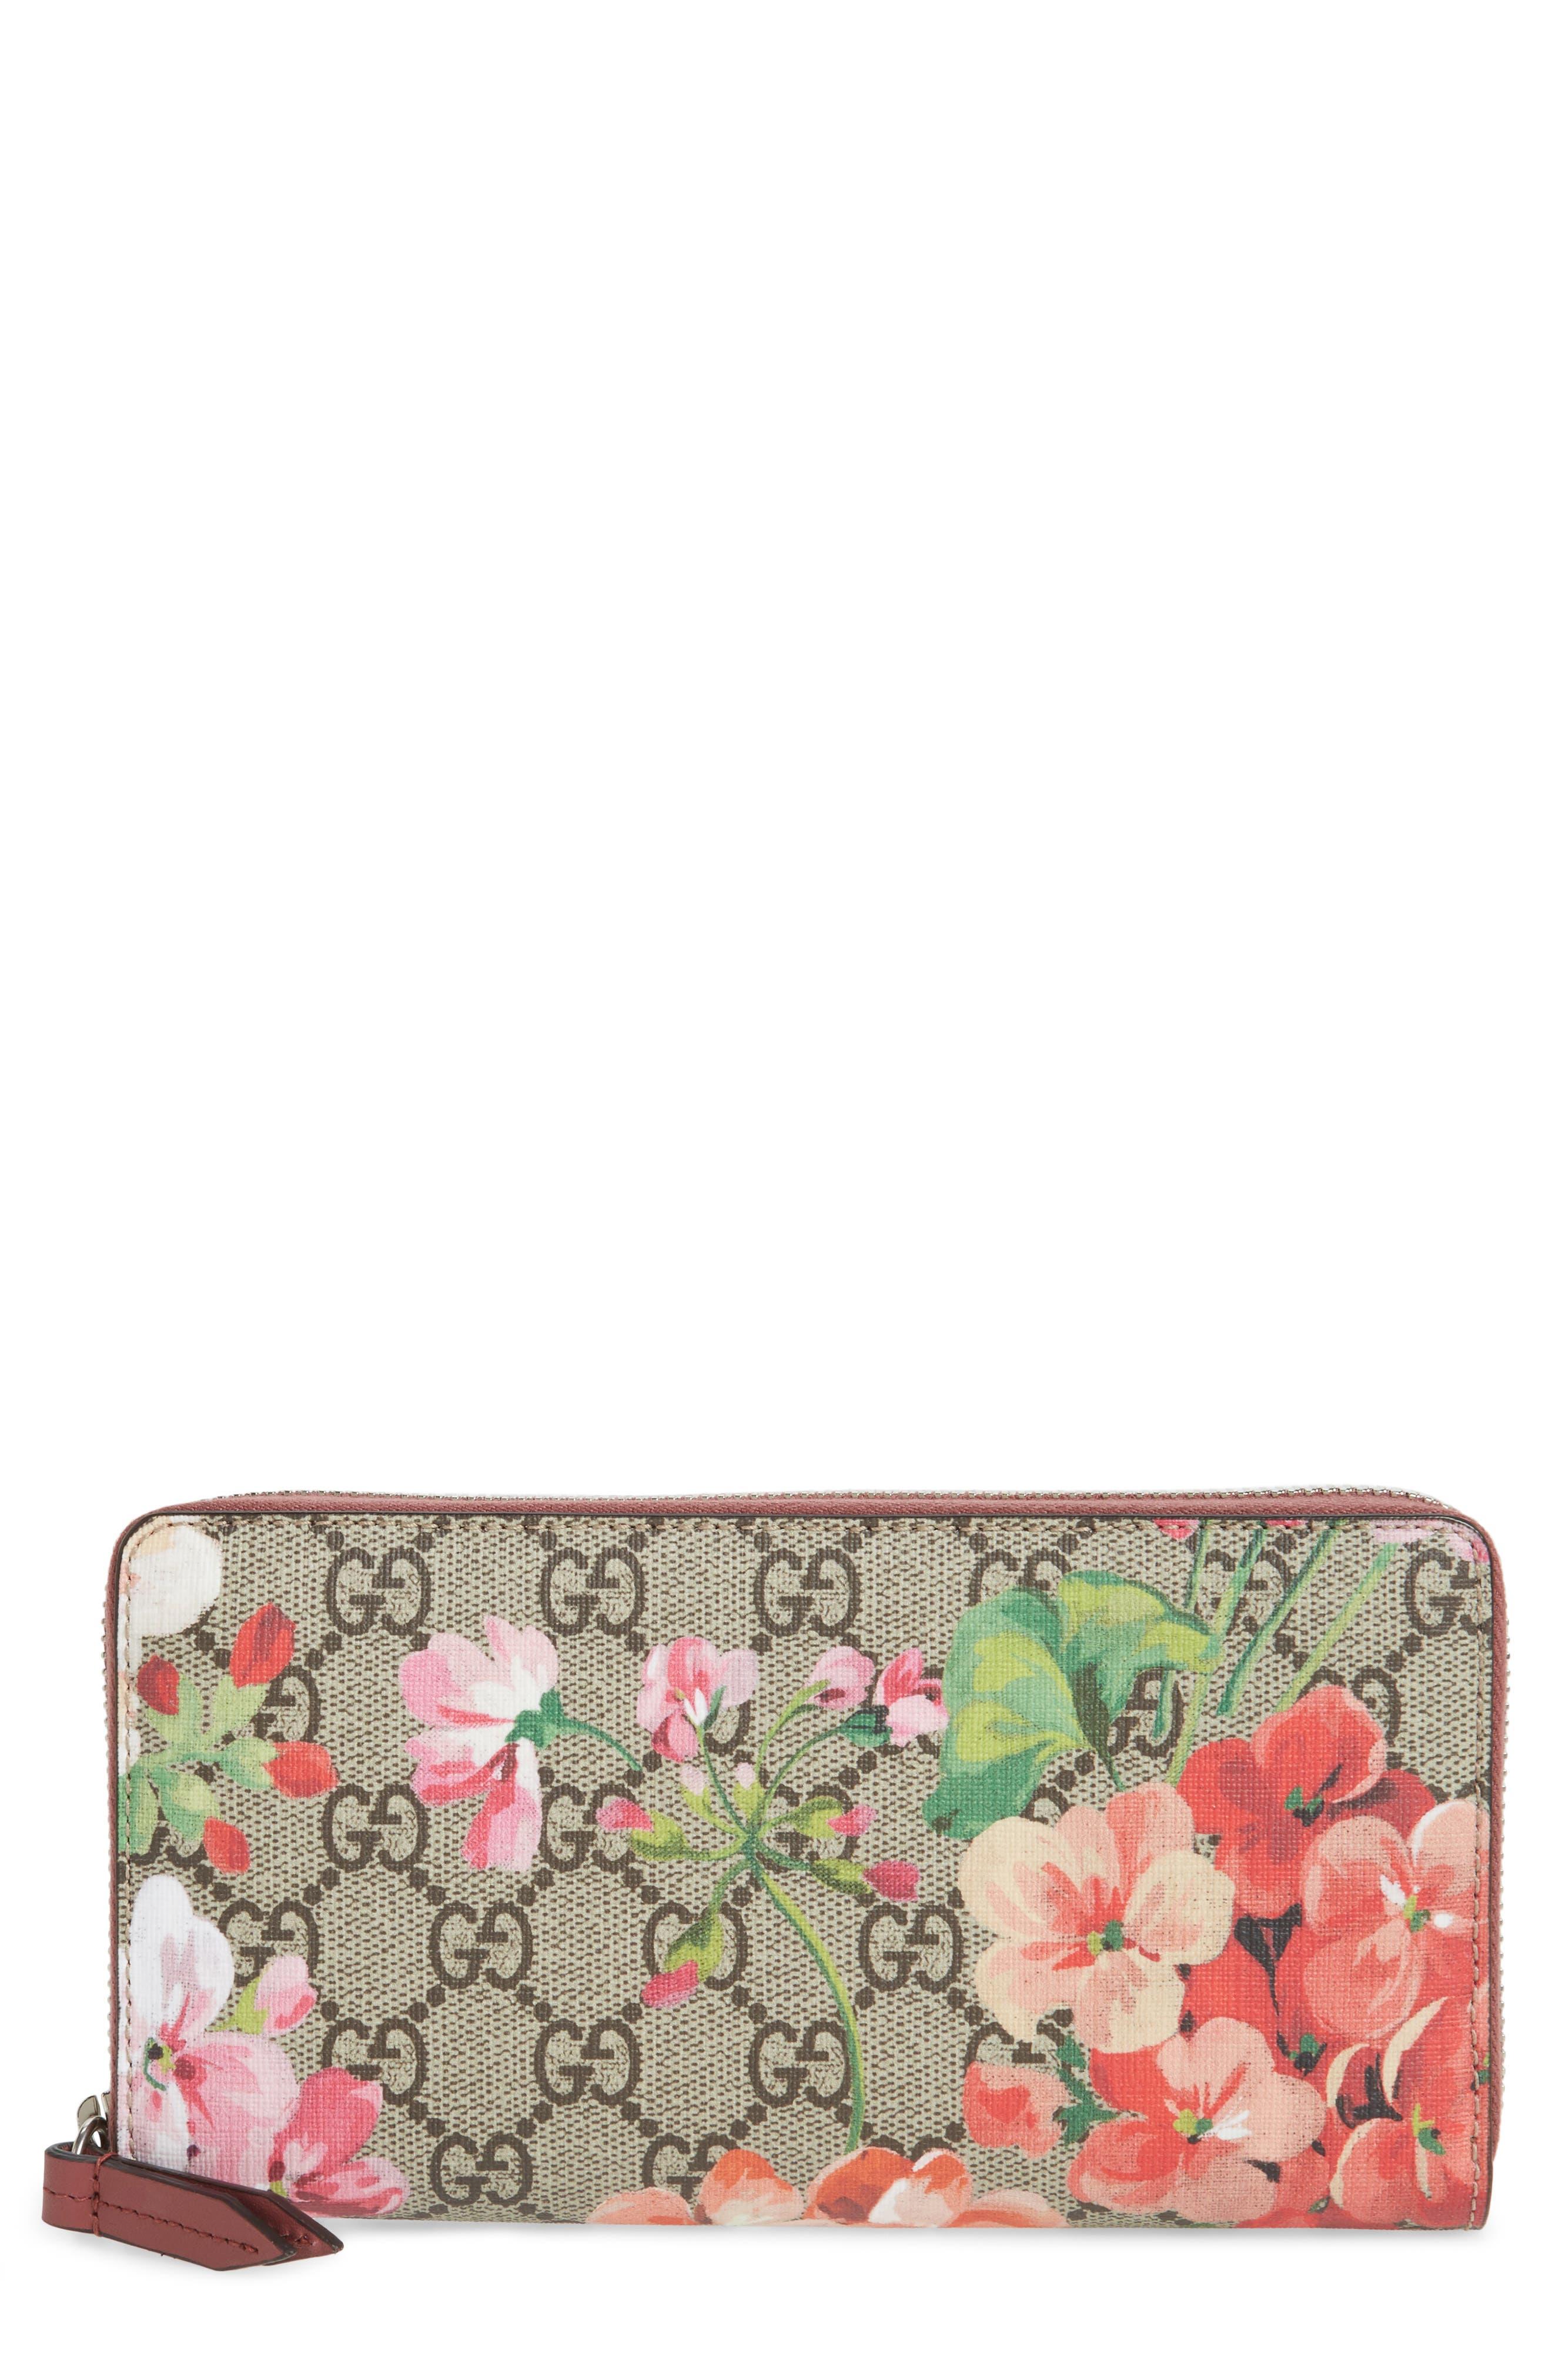 GG Blooms Zip Around Wallet,                         Main,                         color, Beige Ebony Multi/ Dry Rose